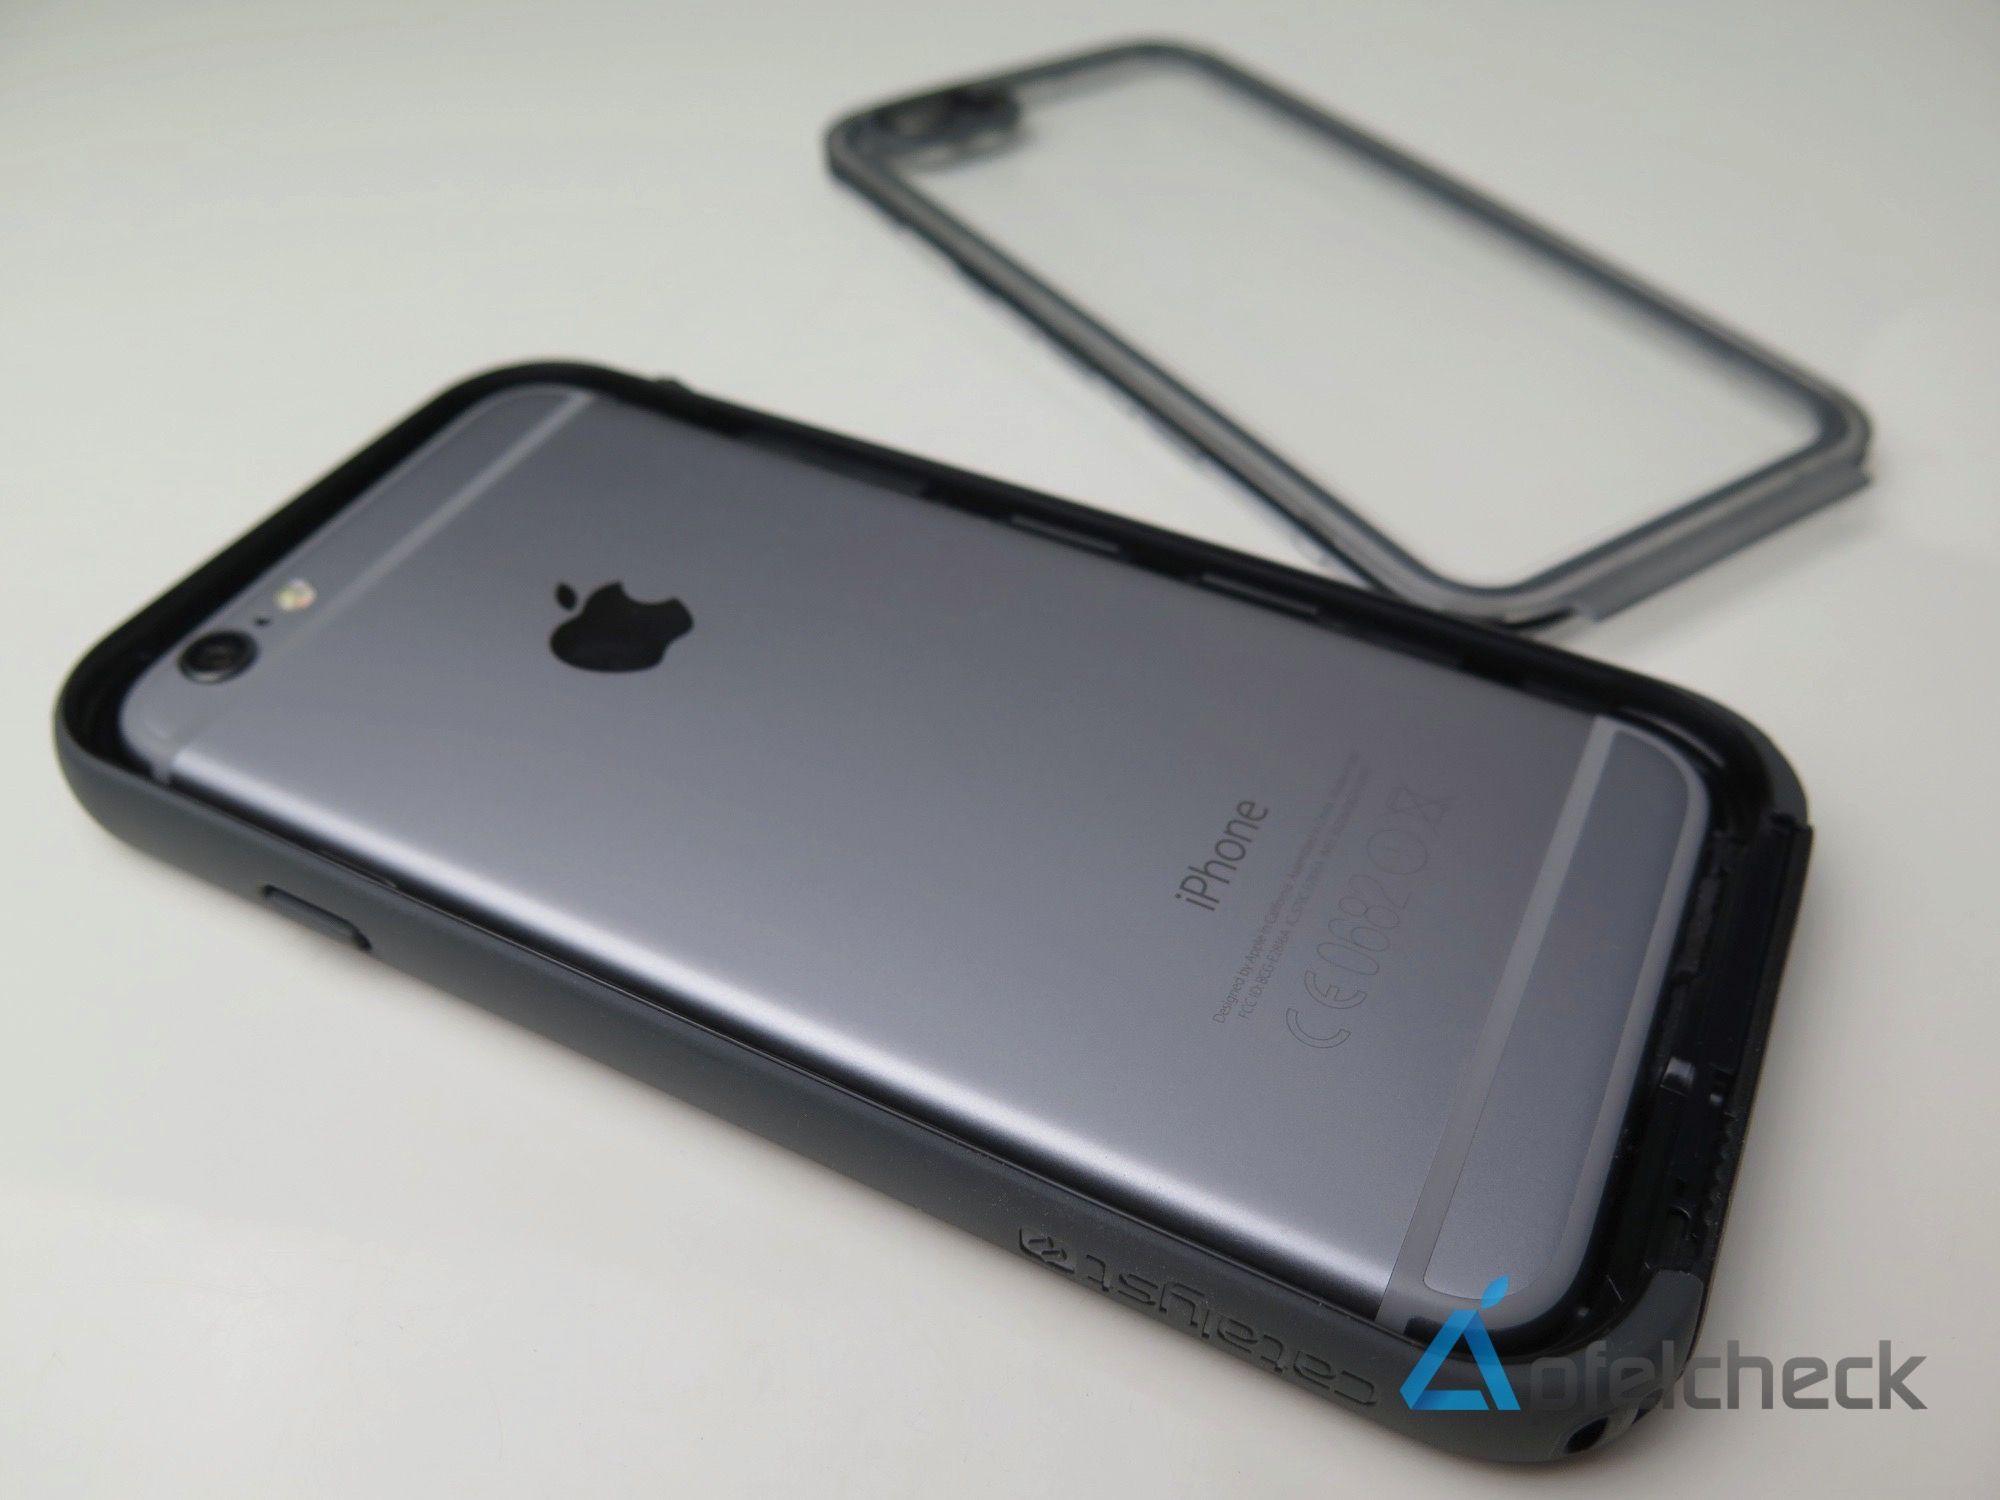 nice Review - Catalyst Waterproof – Wasserdichtes iPhone 6   6 Plus Case  mit Fallschutz nach Militärnorm 3e84d253ccc41